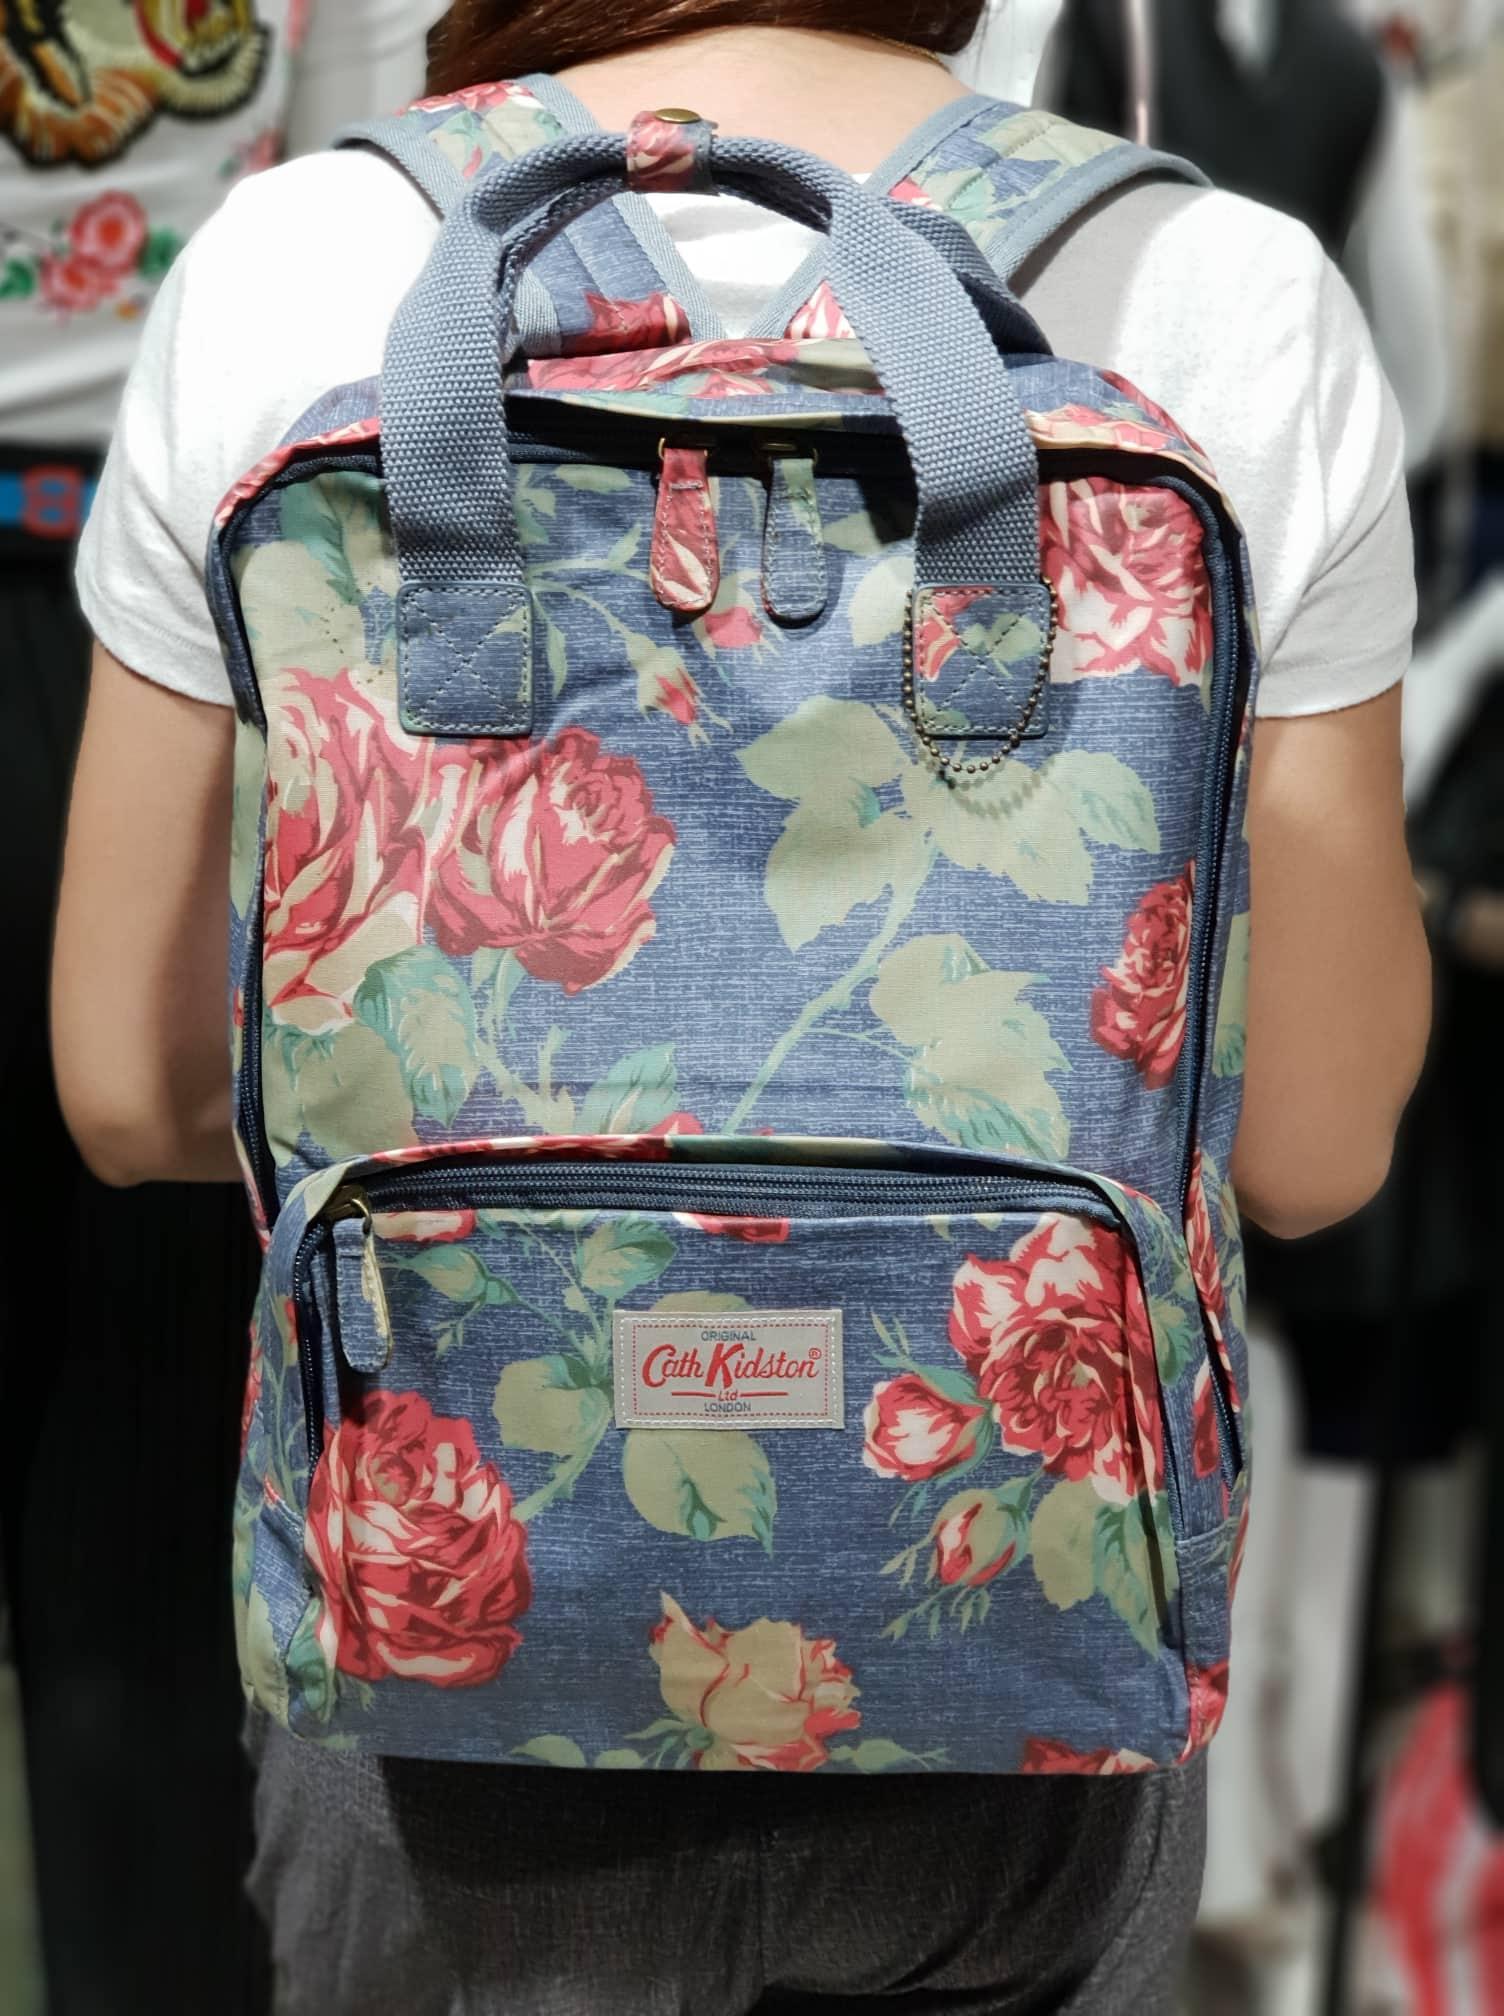 ea253ac1ecf48 Backpack Rucksacks Oxford Rose Print - Denim Cath Kidston Matt Oilcloth